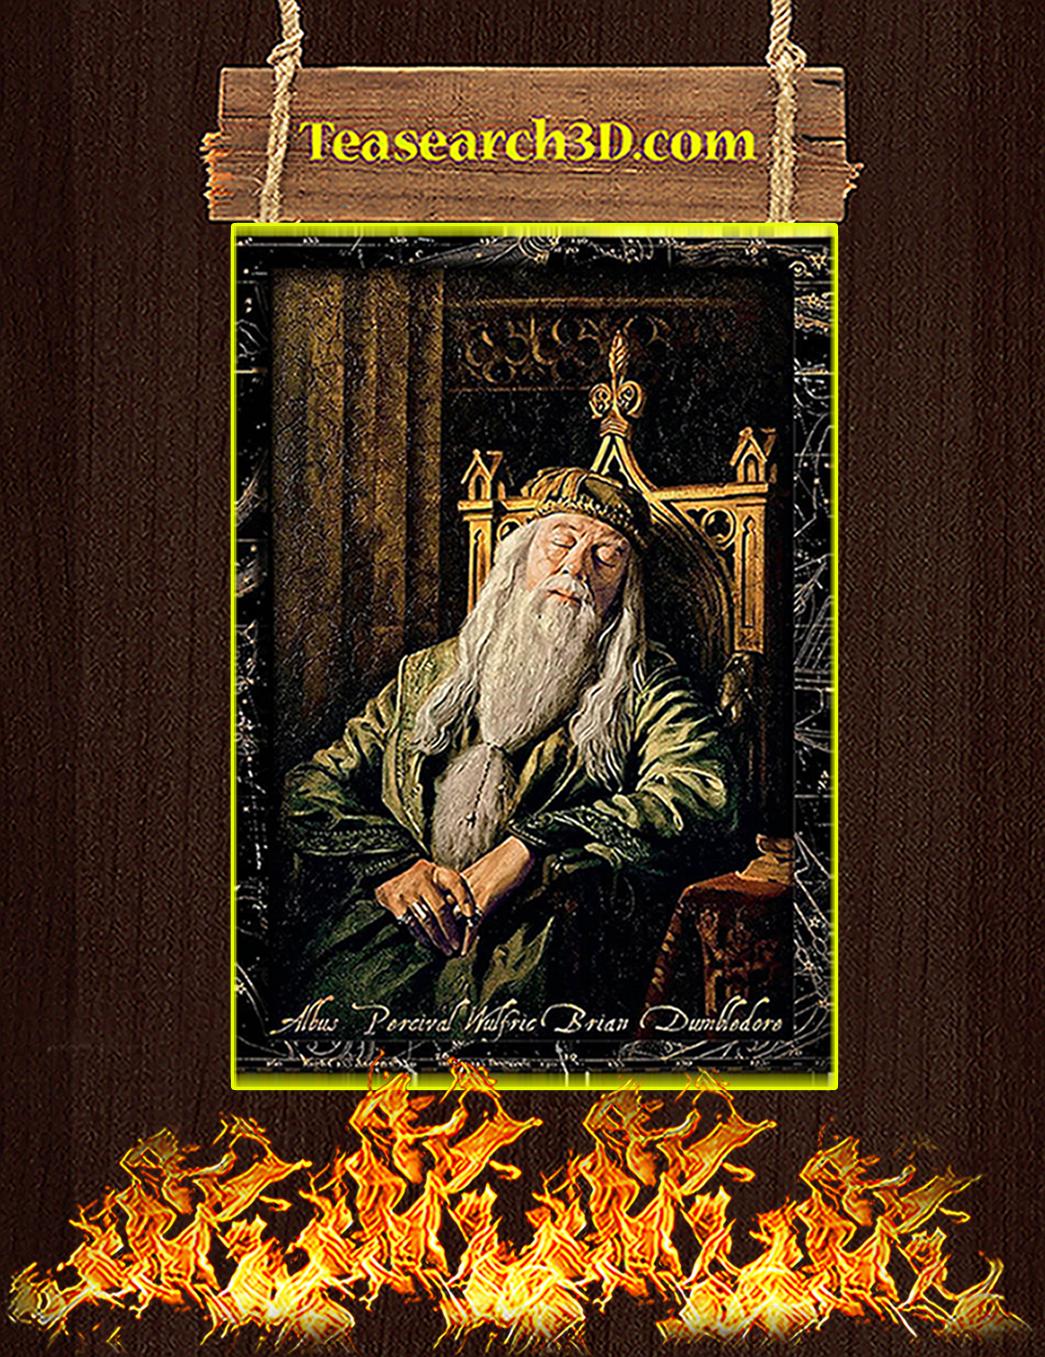 Albus percival wulfric brian dumbledore sleeping poster A1